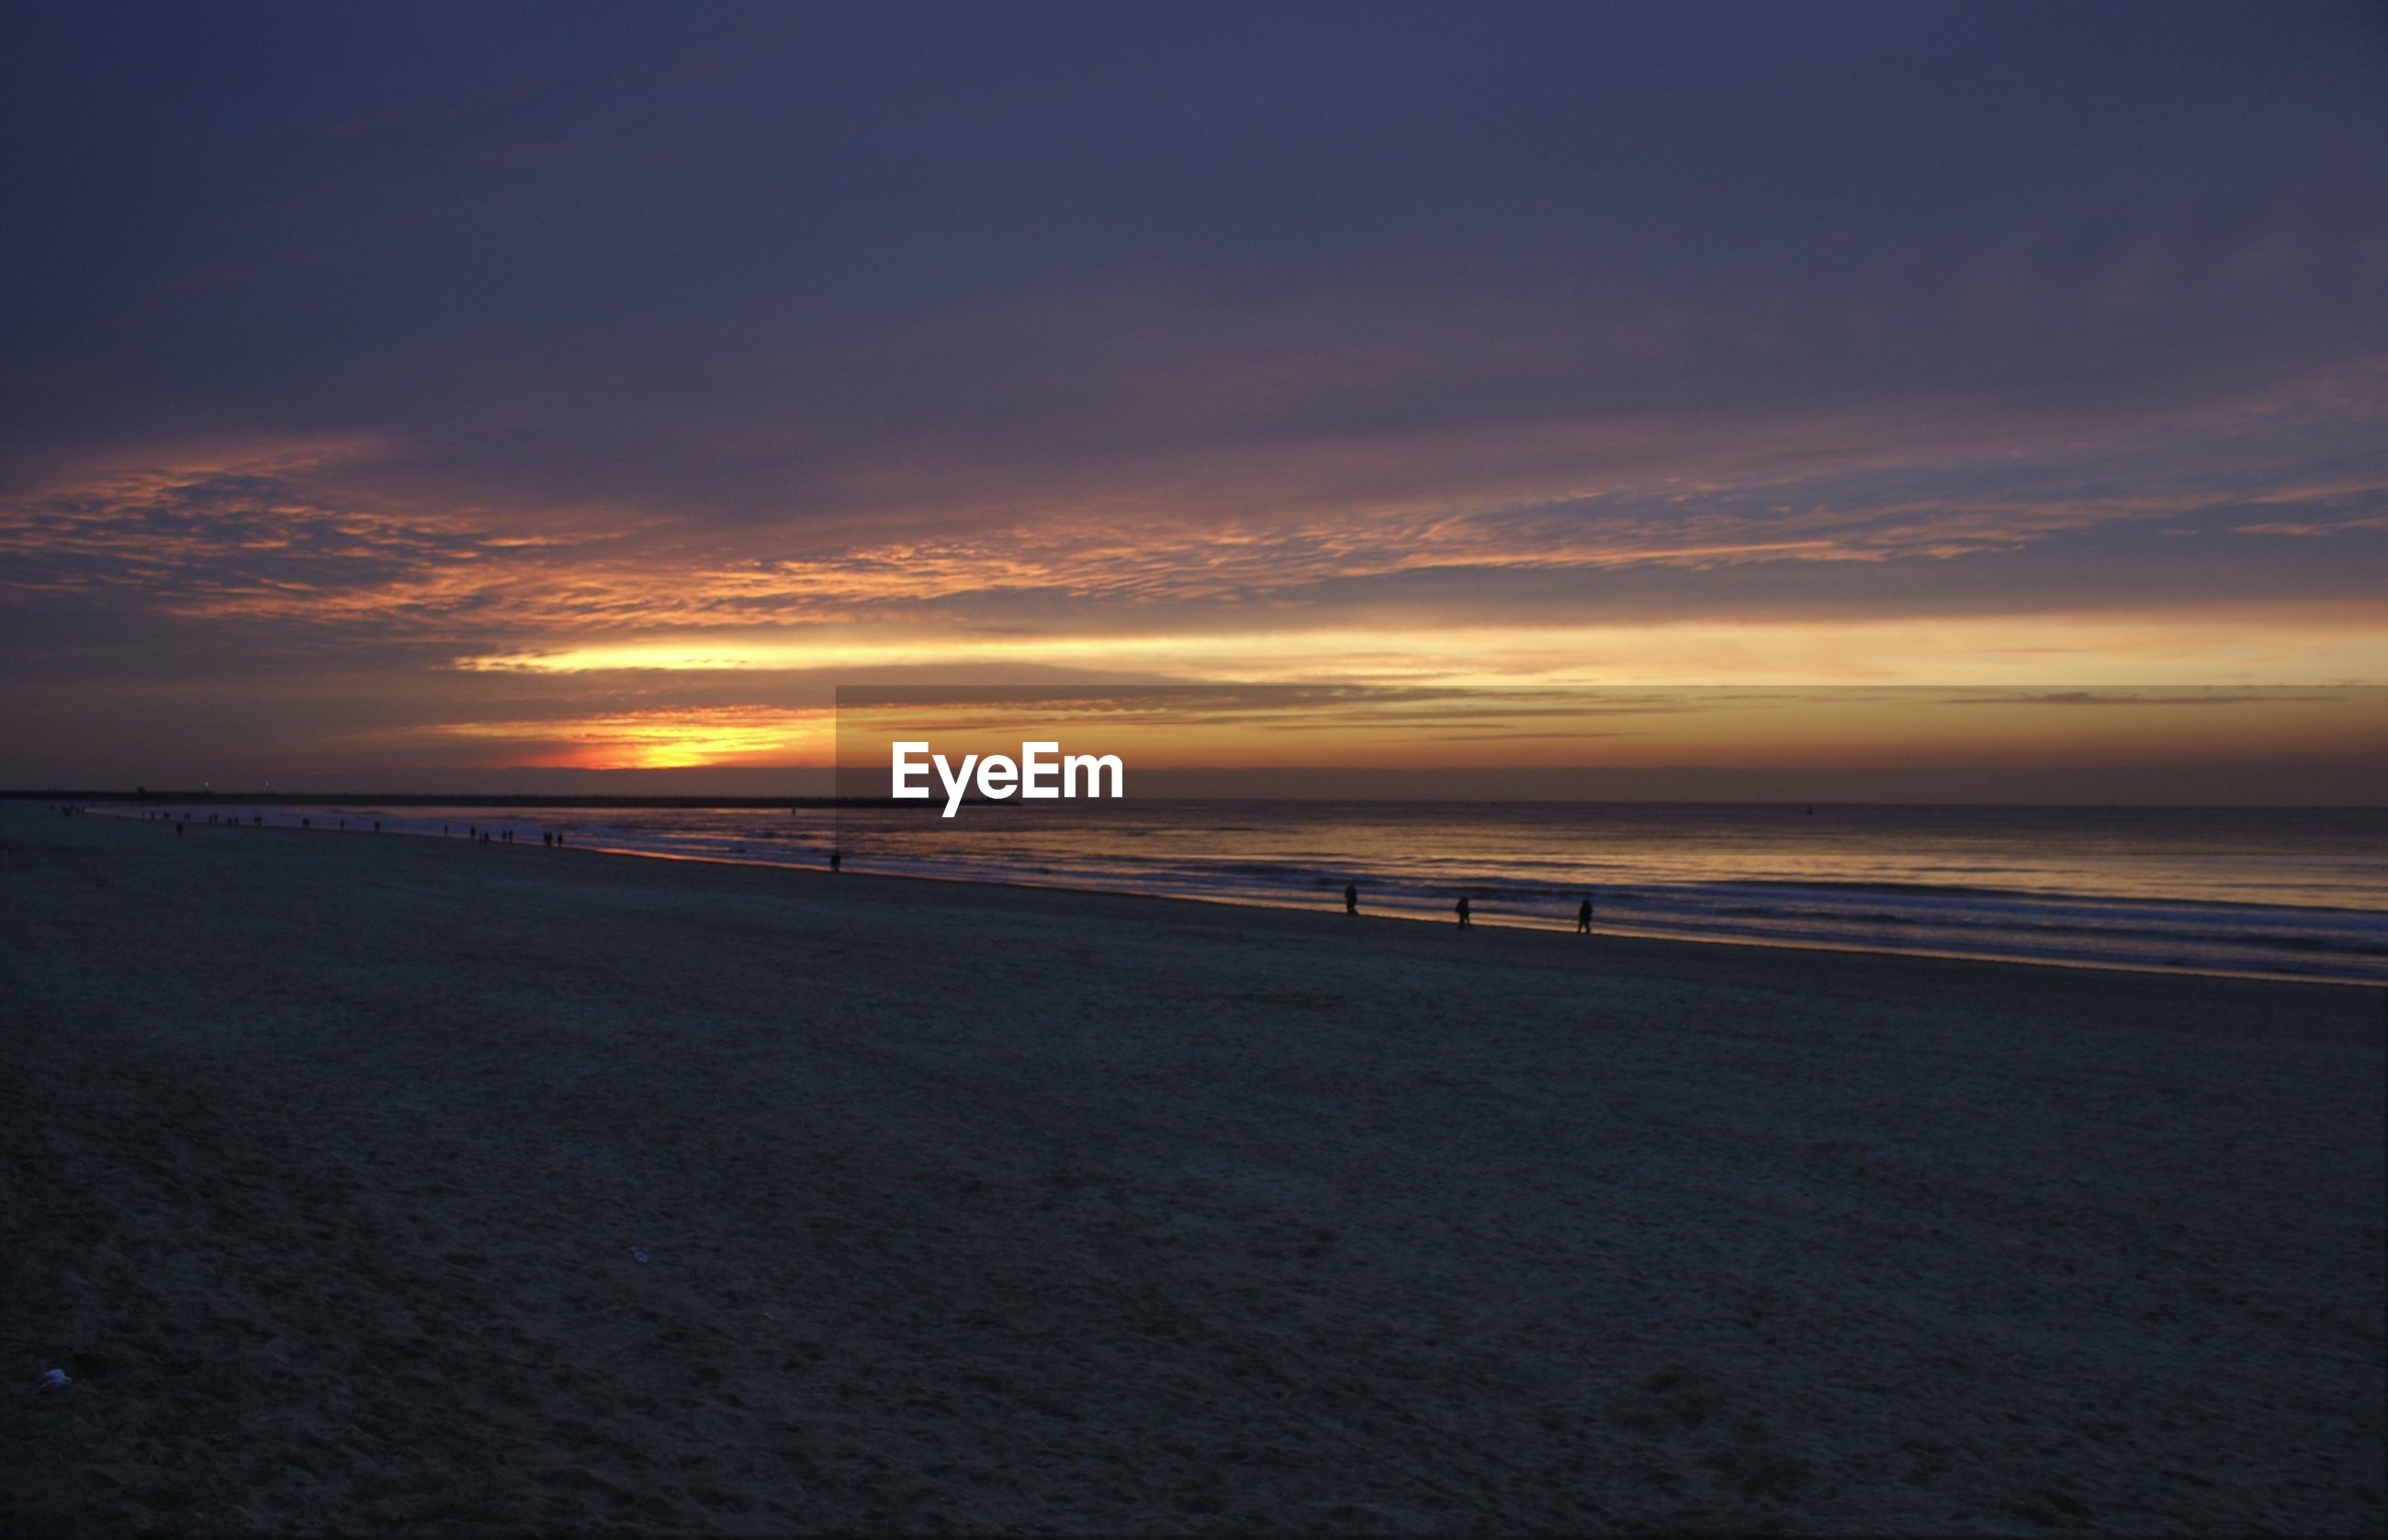 sea, sunset, horizon over water, beach, water, scenics, tranquil scene, sky, shore, tranquility, beauty in nature, sand, orange color, idyllic, nature, silhouette, cloud - sky, incidental people, cloud, coastline